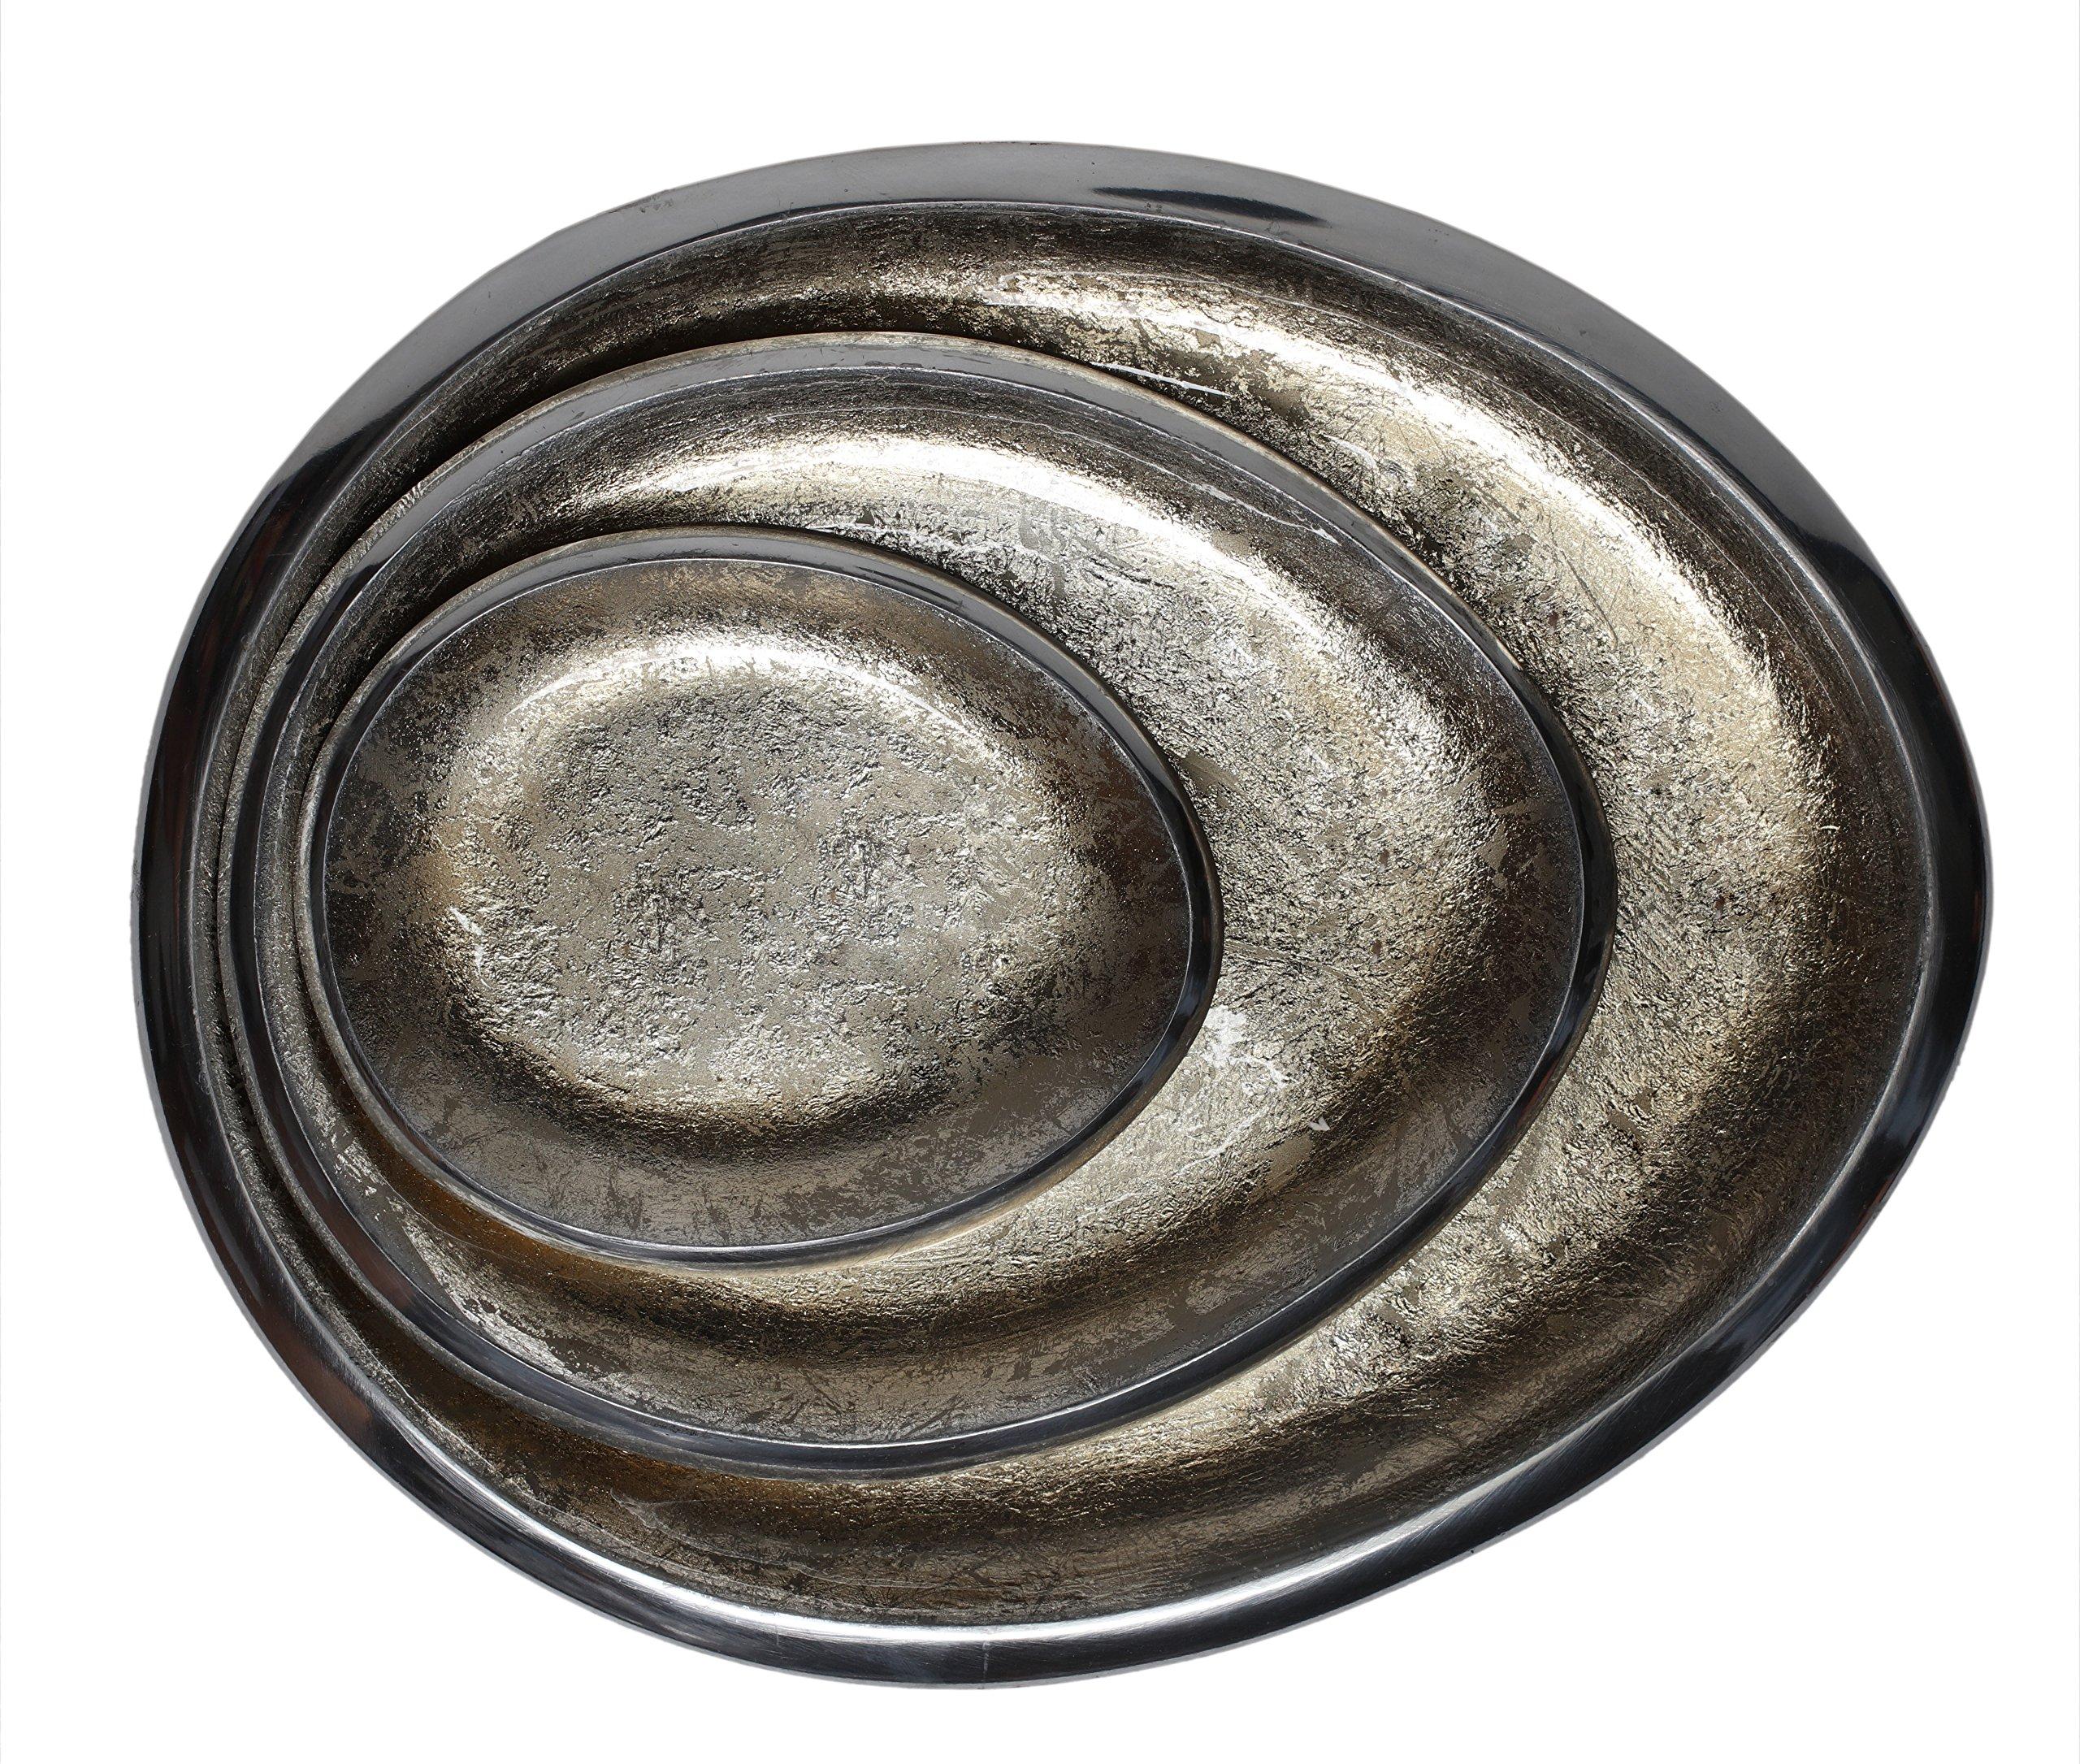 Melange Home Decor Cuivre Collection, Set of 3 Oval Platters - 6'', 9'' and 12'', Color - Beige